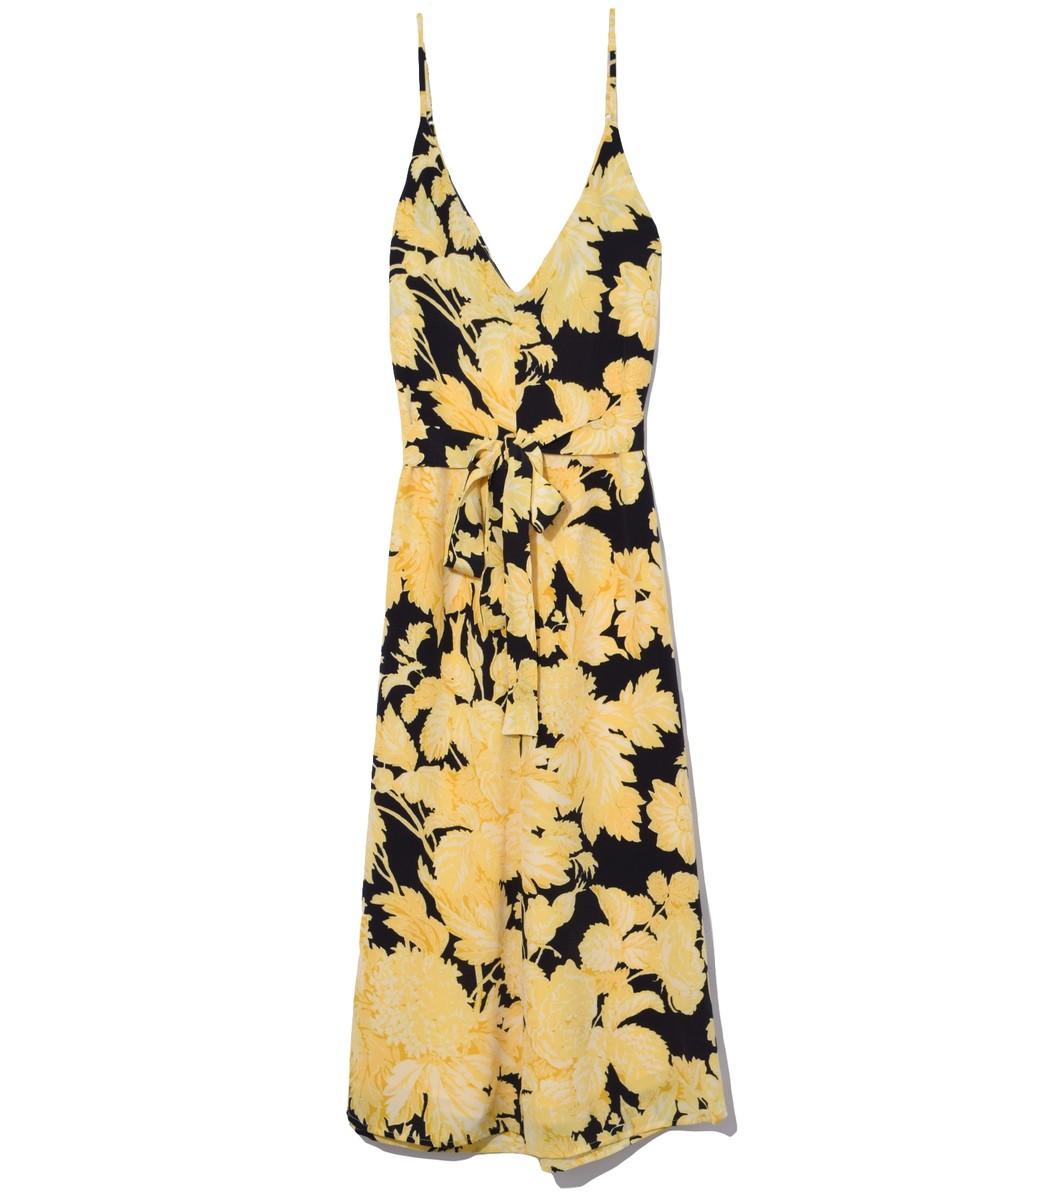 Stine Goya Gianna Slip Dress in Hortensia Dark